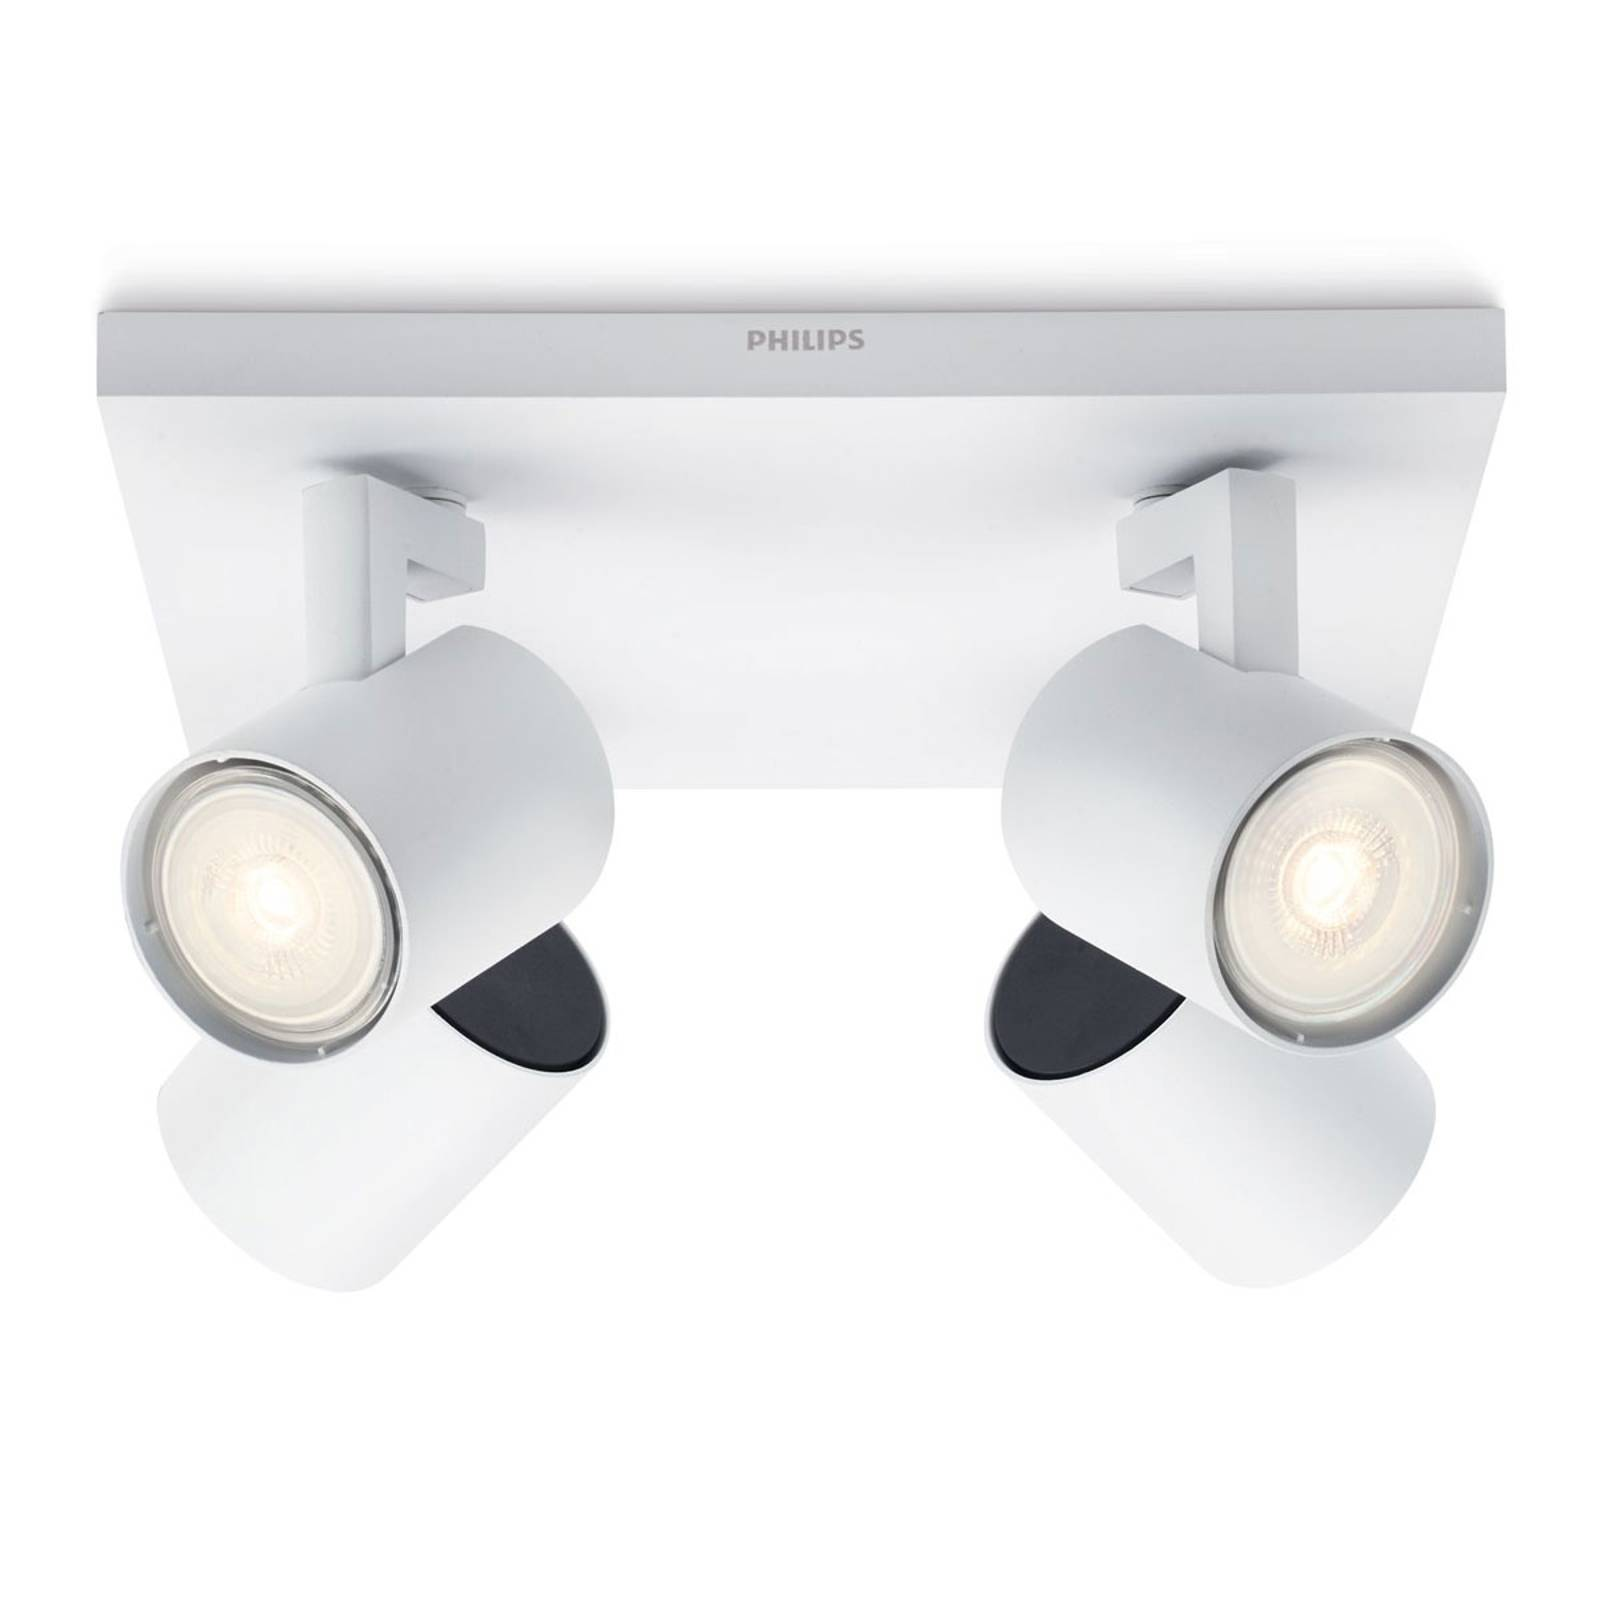 Philips Runner LED-kattovalaisin 4-lamppuinen